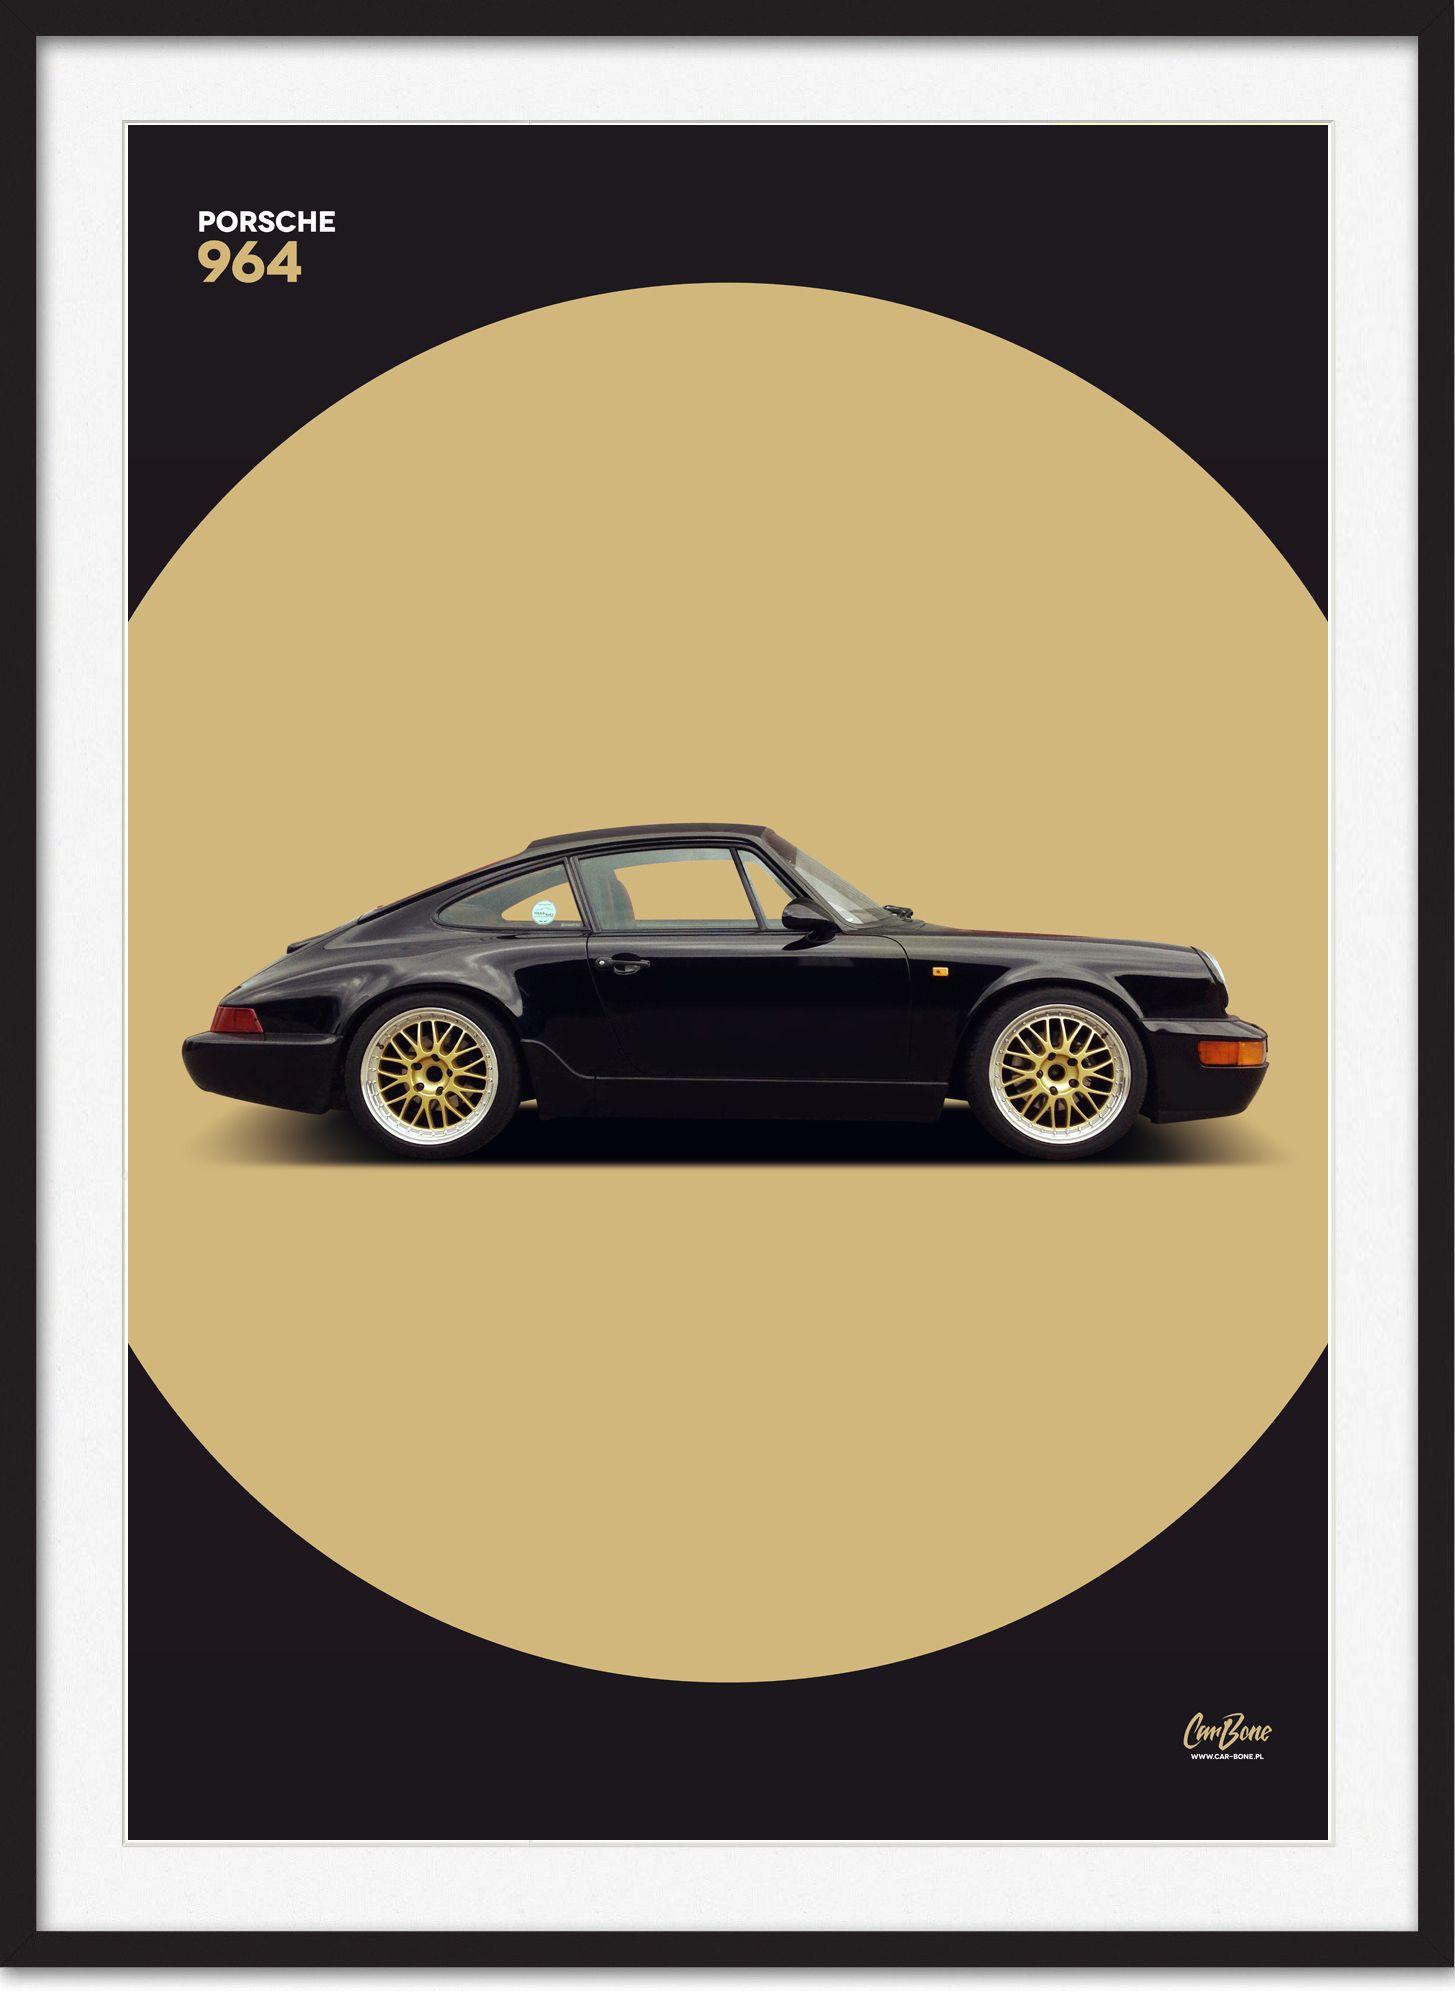 New Porsche Posters Have Just Been Added To The Shop Porsche Porsche 964 Vintage Racing Poster